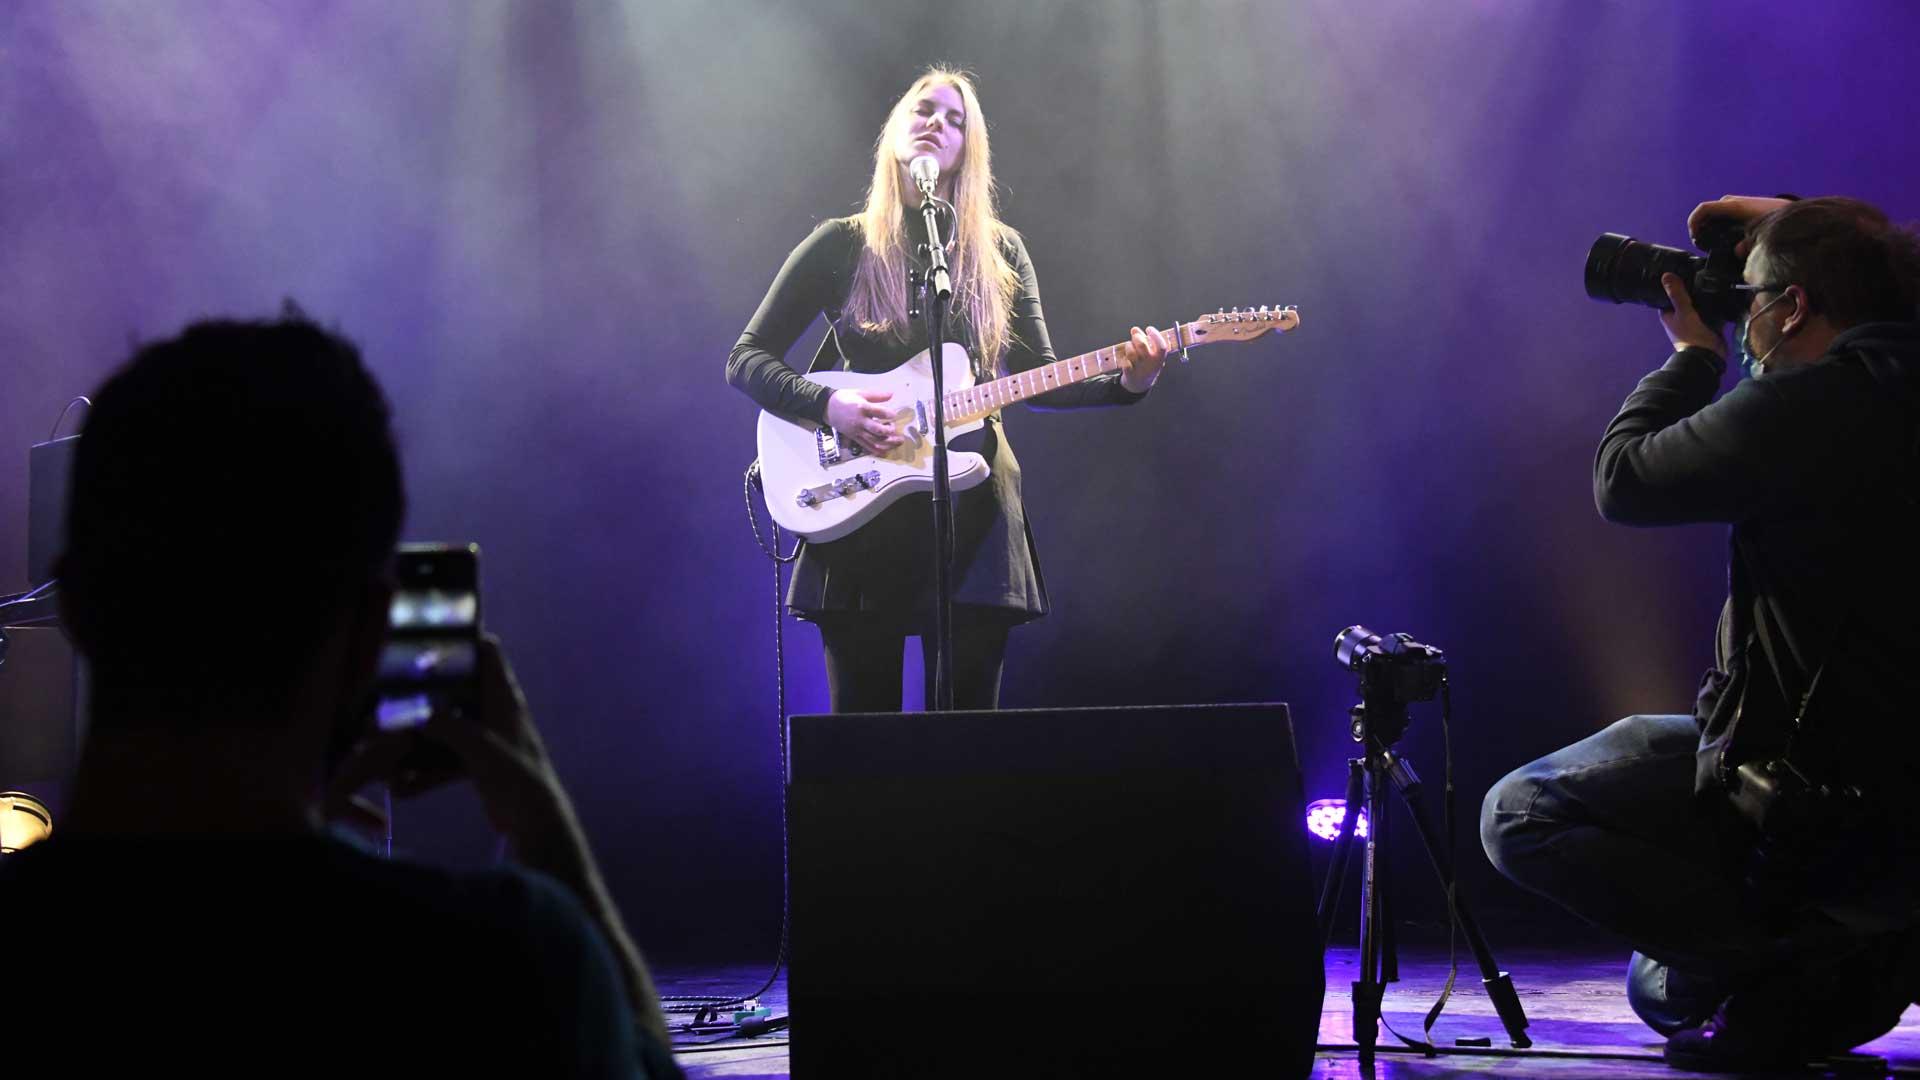 Festival Babel : Daria Arkova sur scène